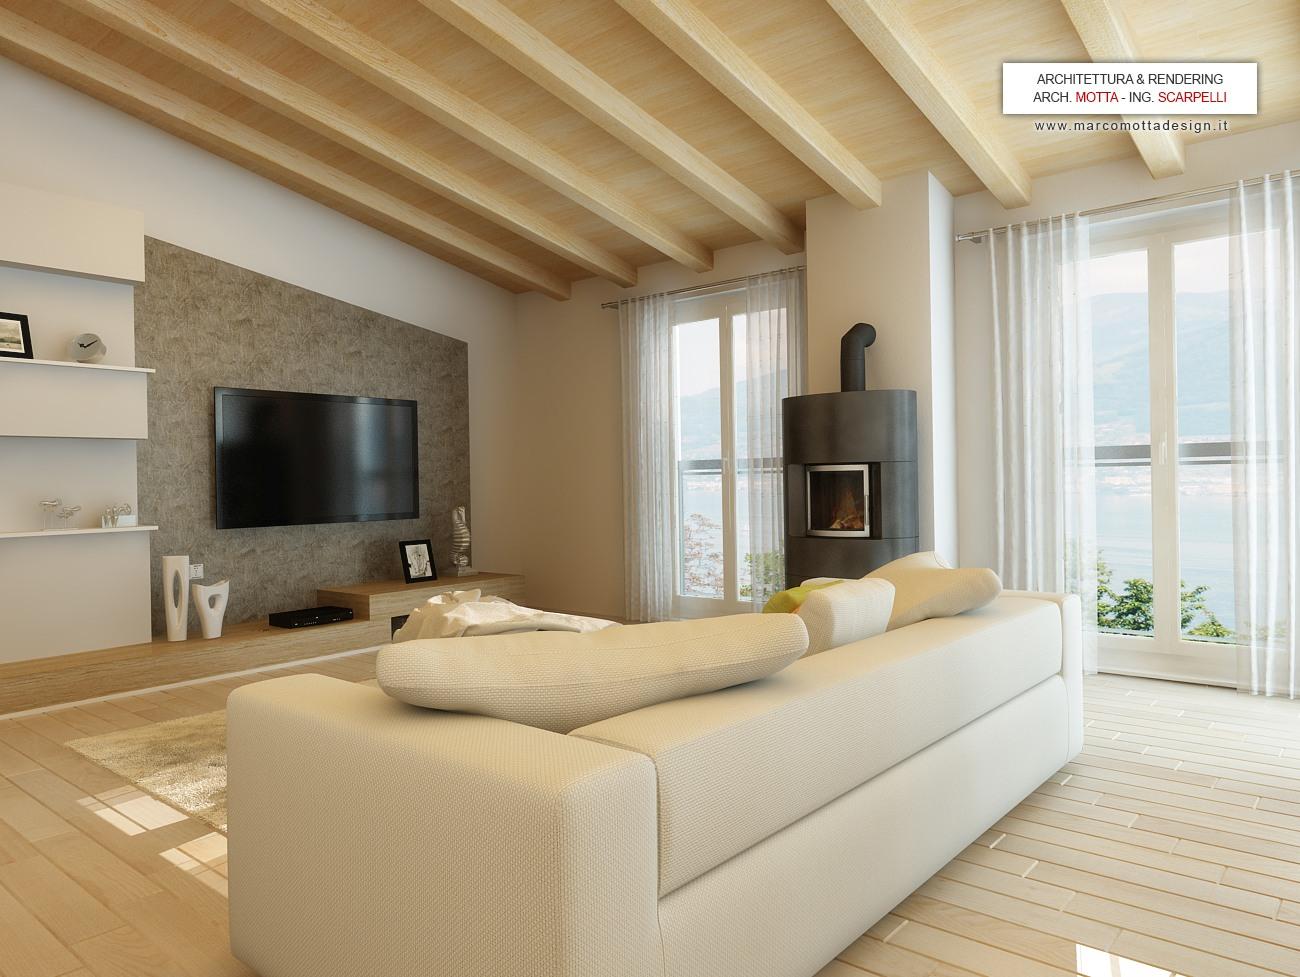 Rendering 3d marco motta design for Design render milano